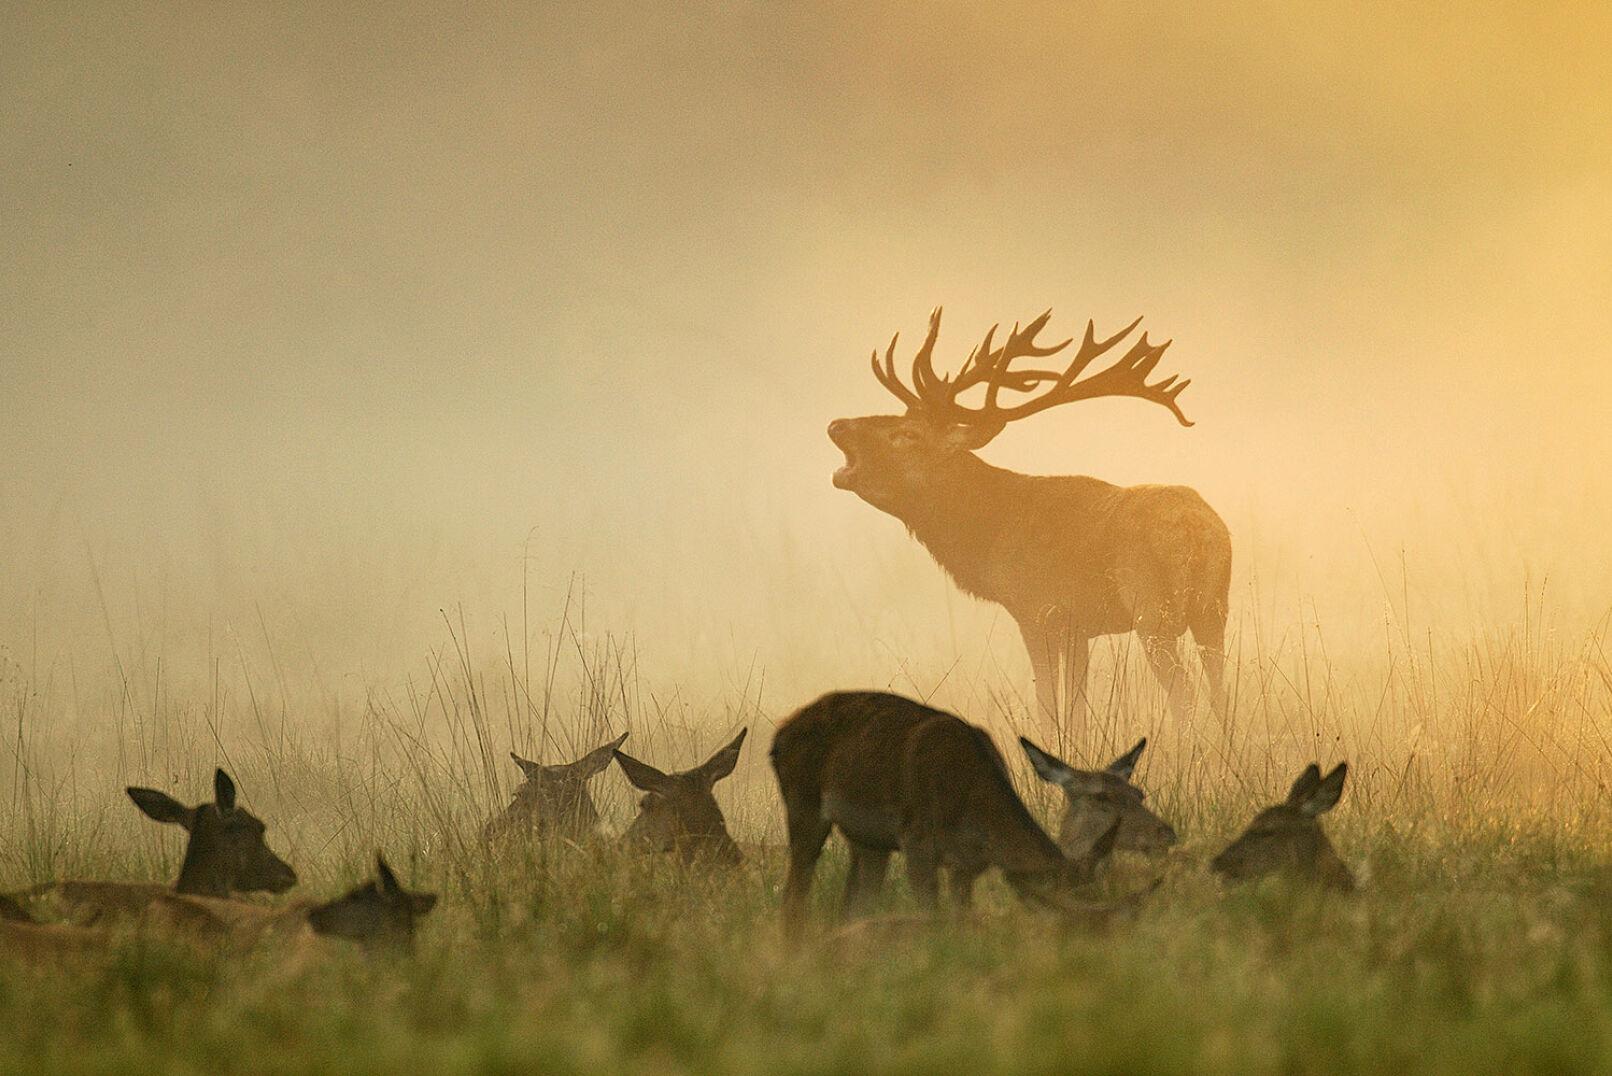 Angebirscht - Rotwild - © Michael Breuer